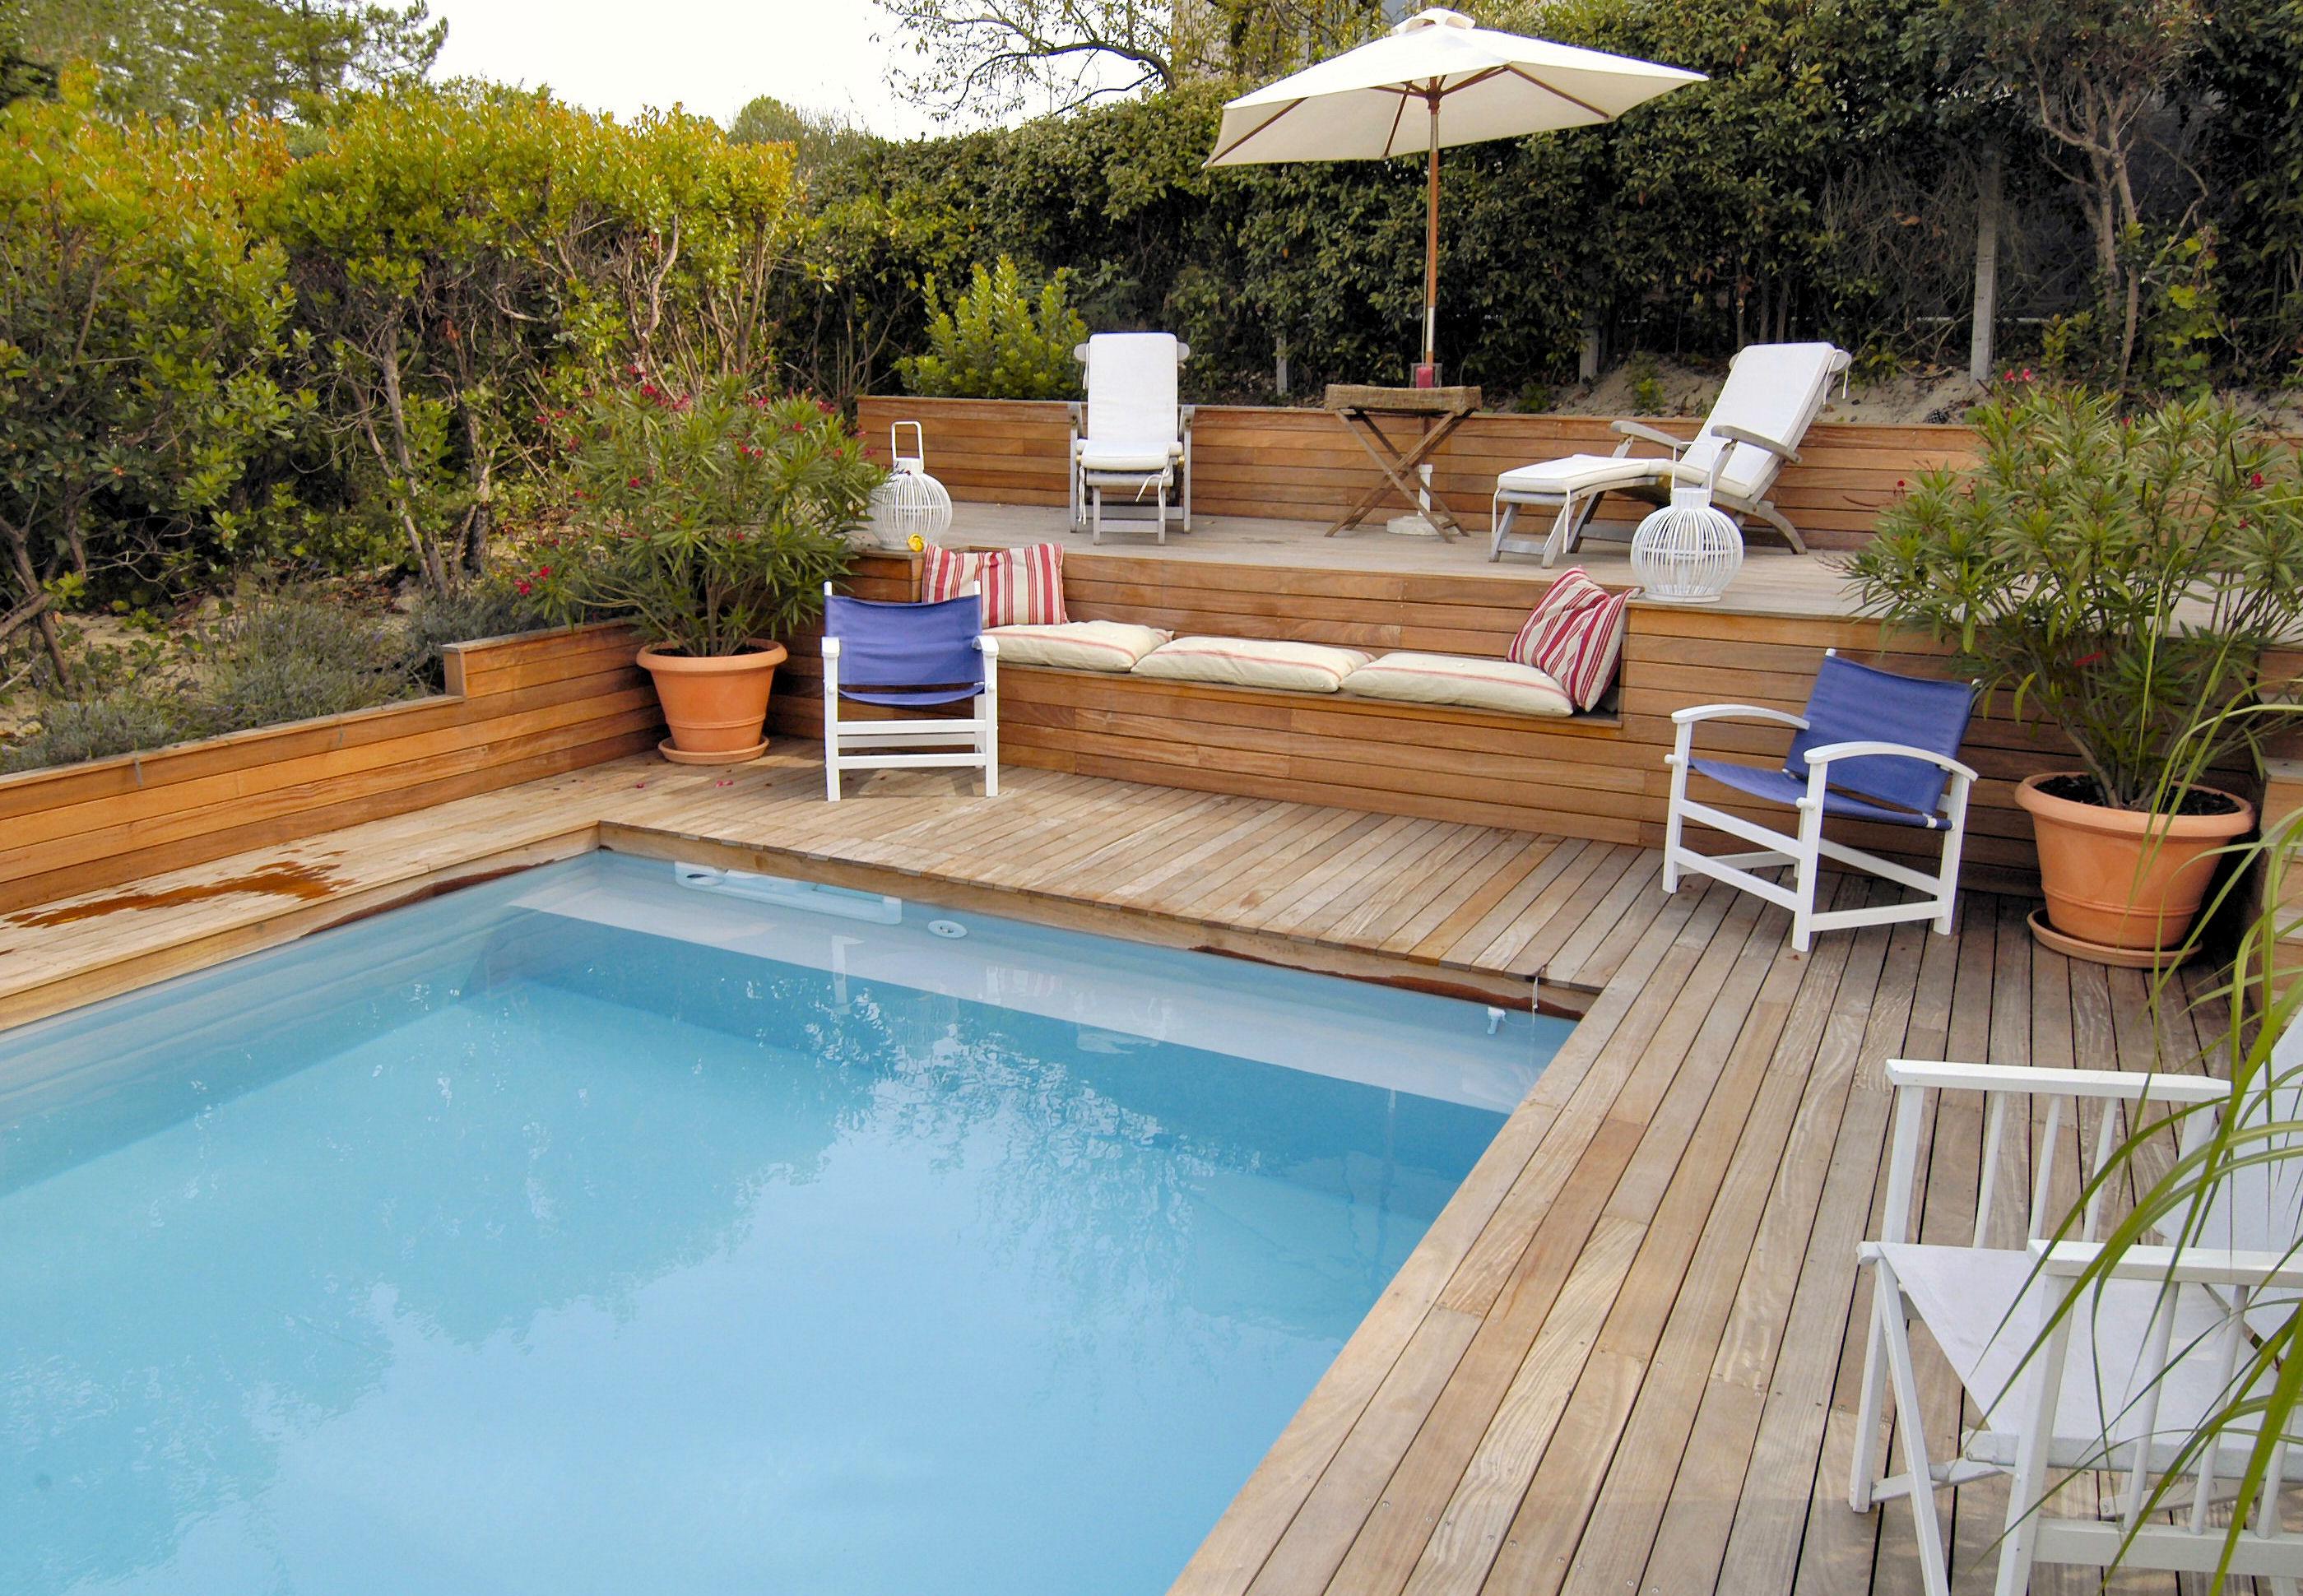 Terrasse piscine semi enterree - Hivernage piscine bois semi enterree ...